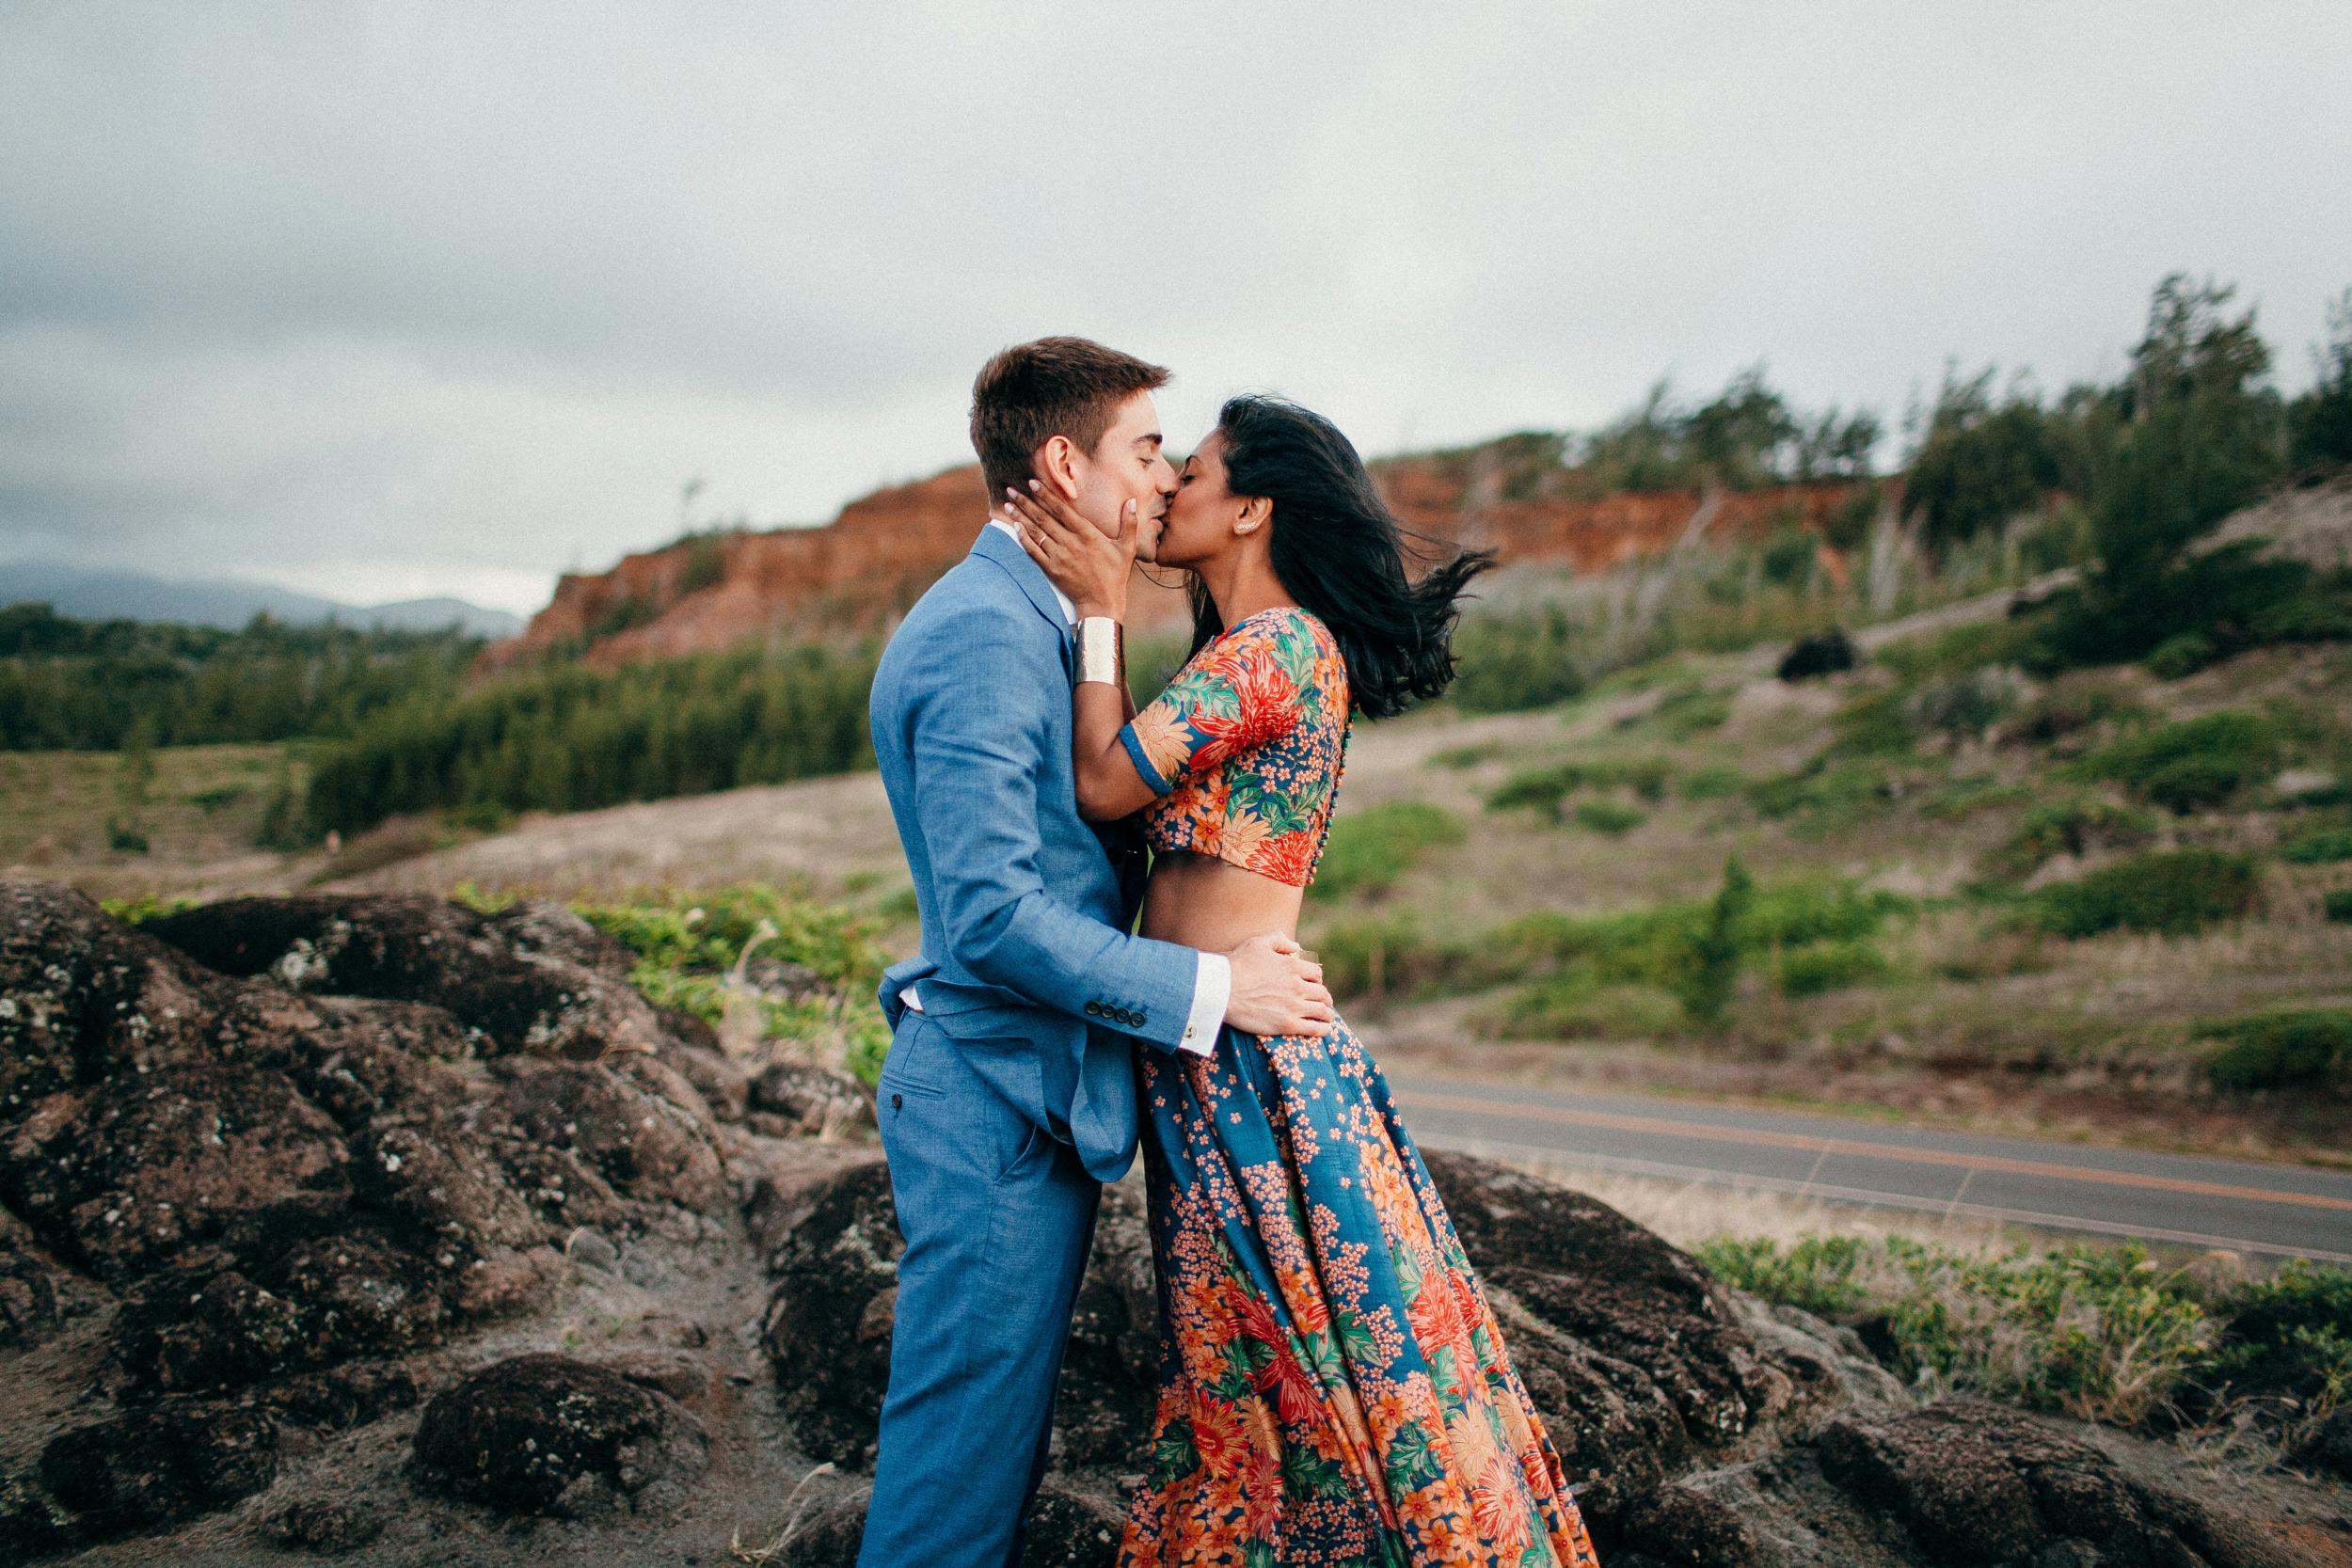 honolulu-hawaii-elopement-wedding-photographer_0025.jpg